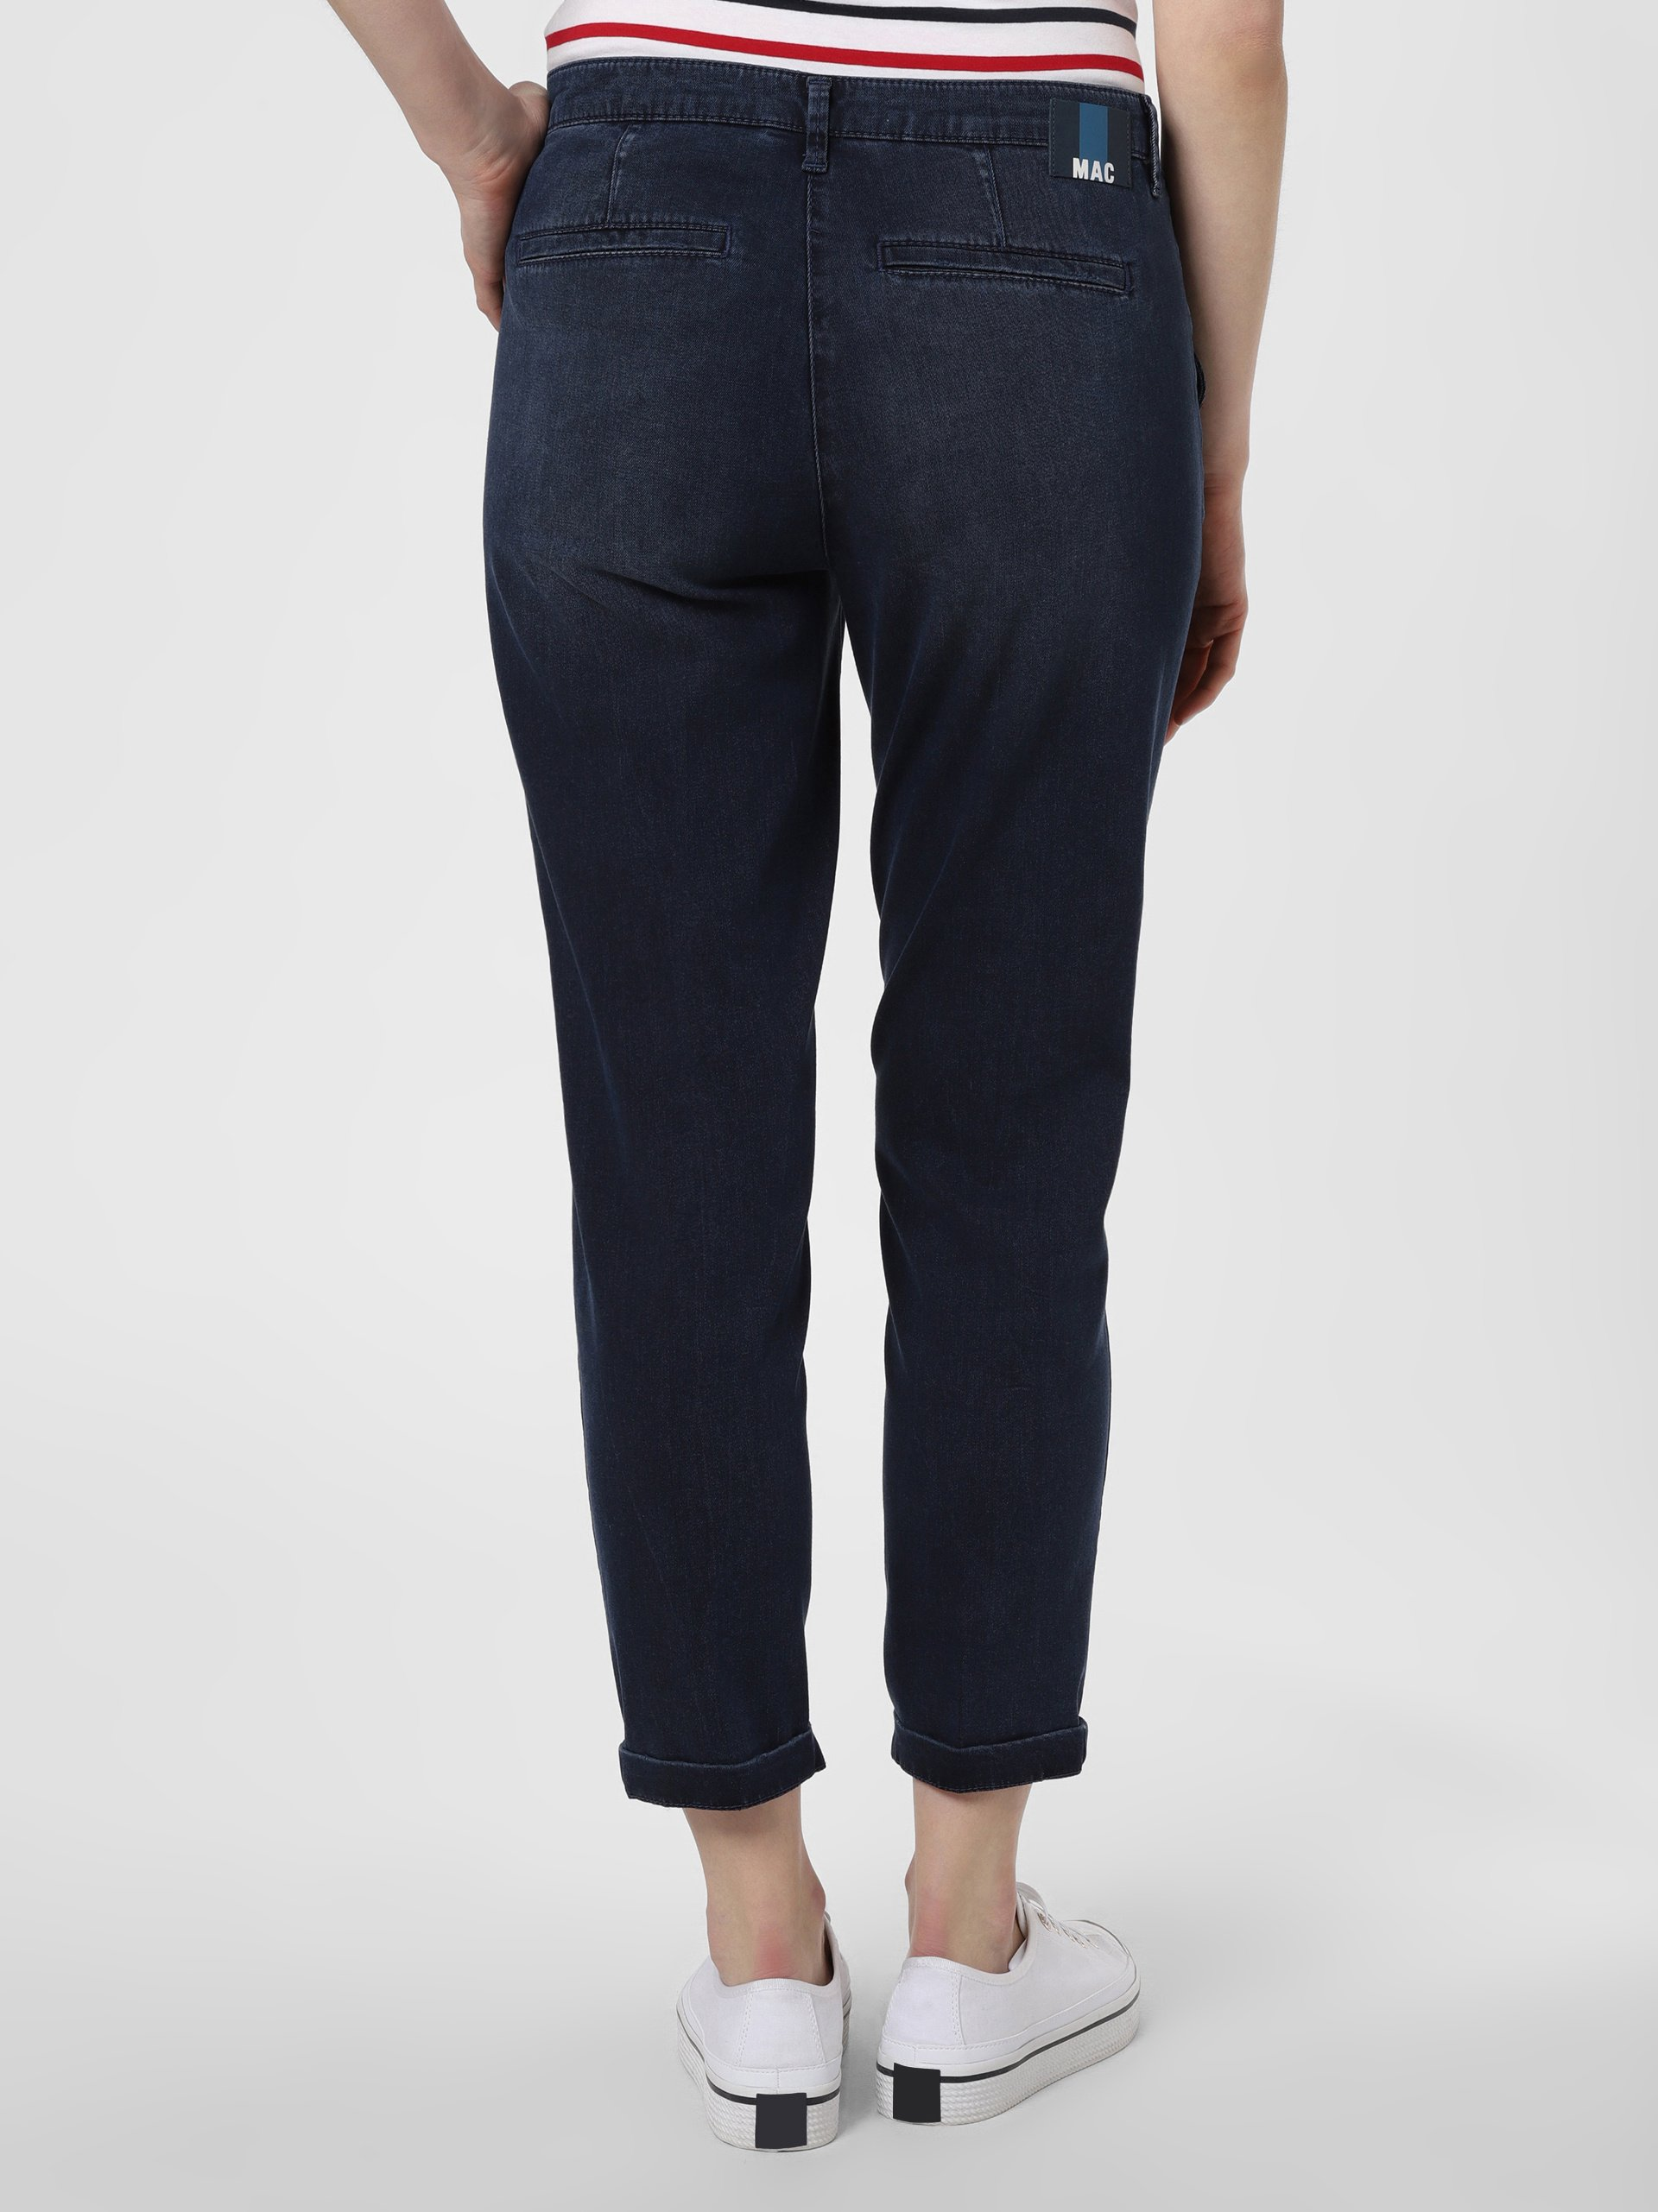 MAC Damen Jeans - Chino